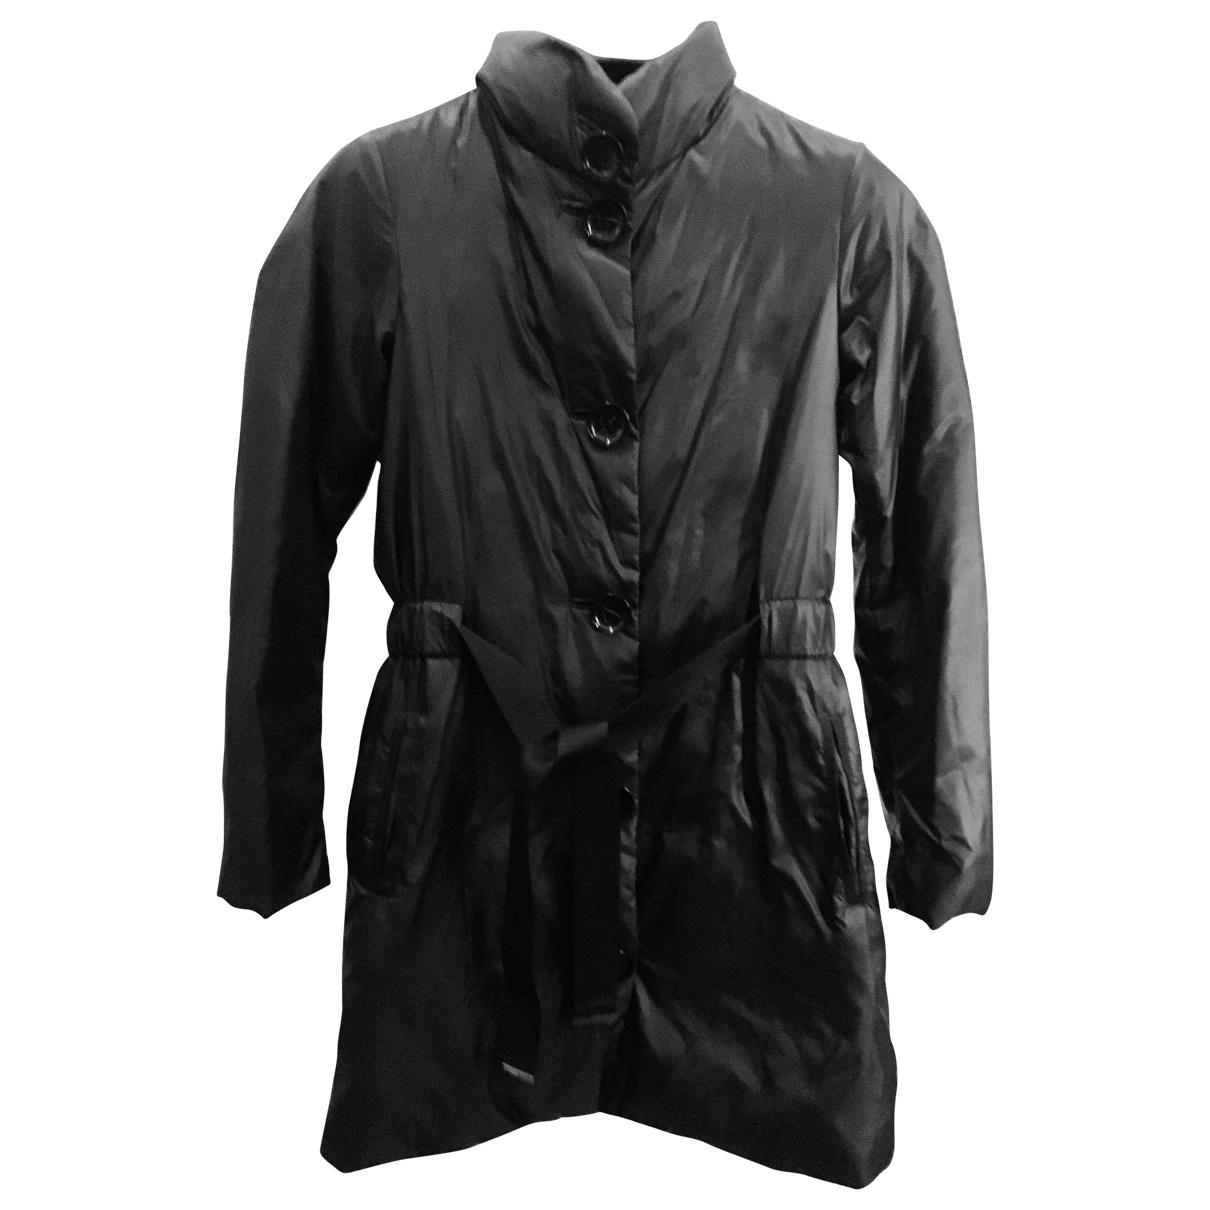 Emporio Armani \N Black coat for Women 38 IT